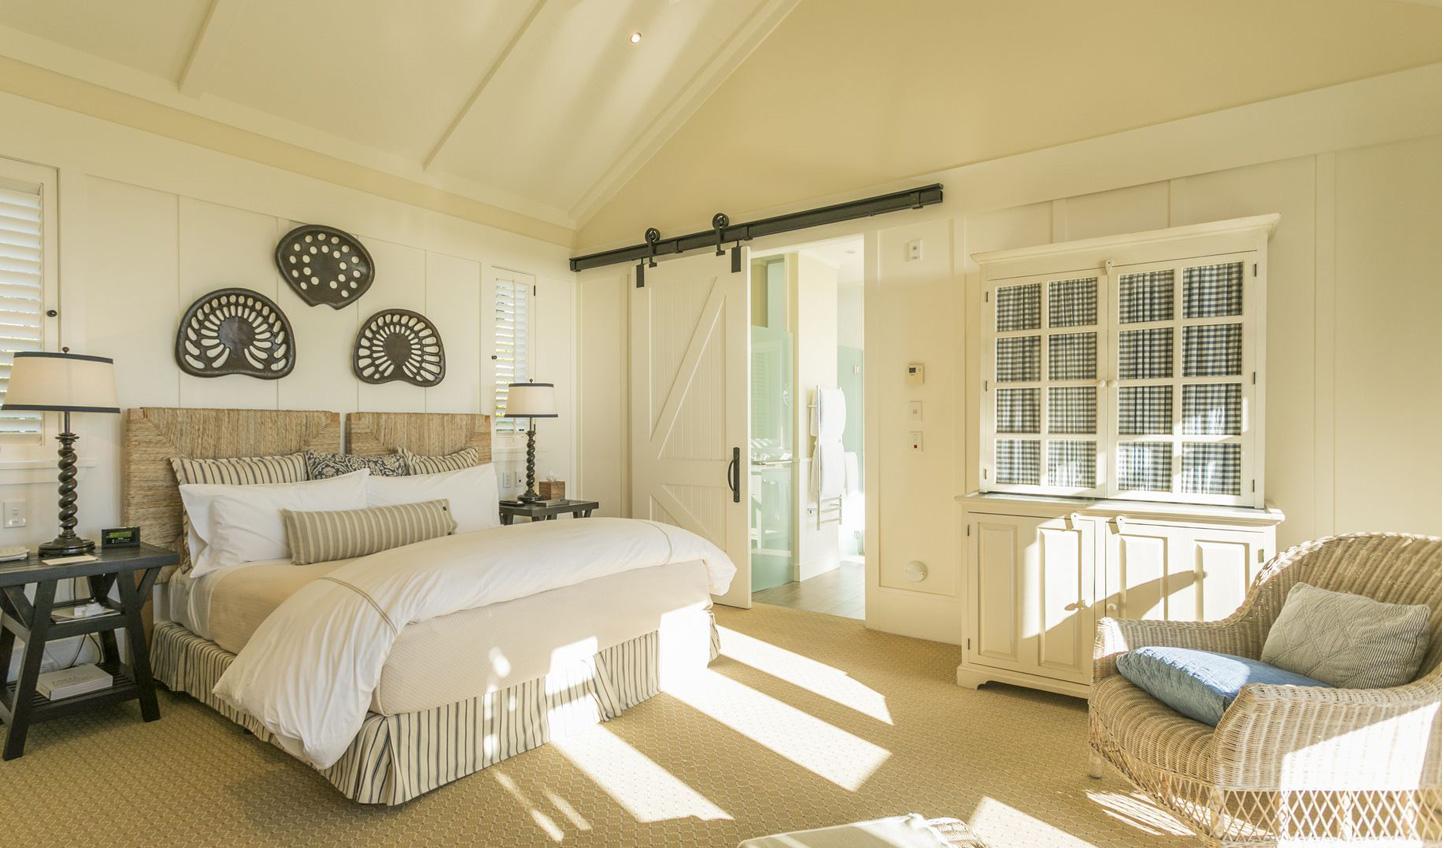 Rustic luxury in the Hilltop Suite